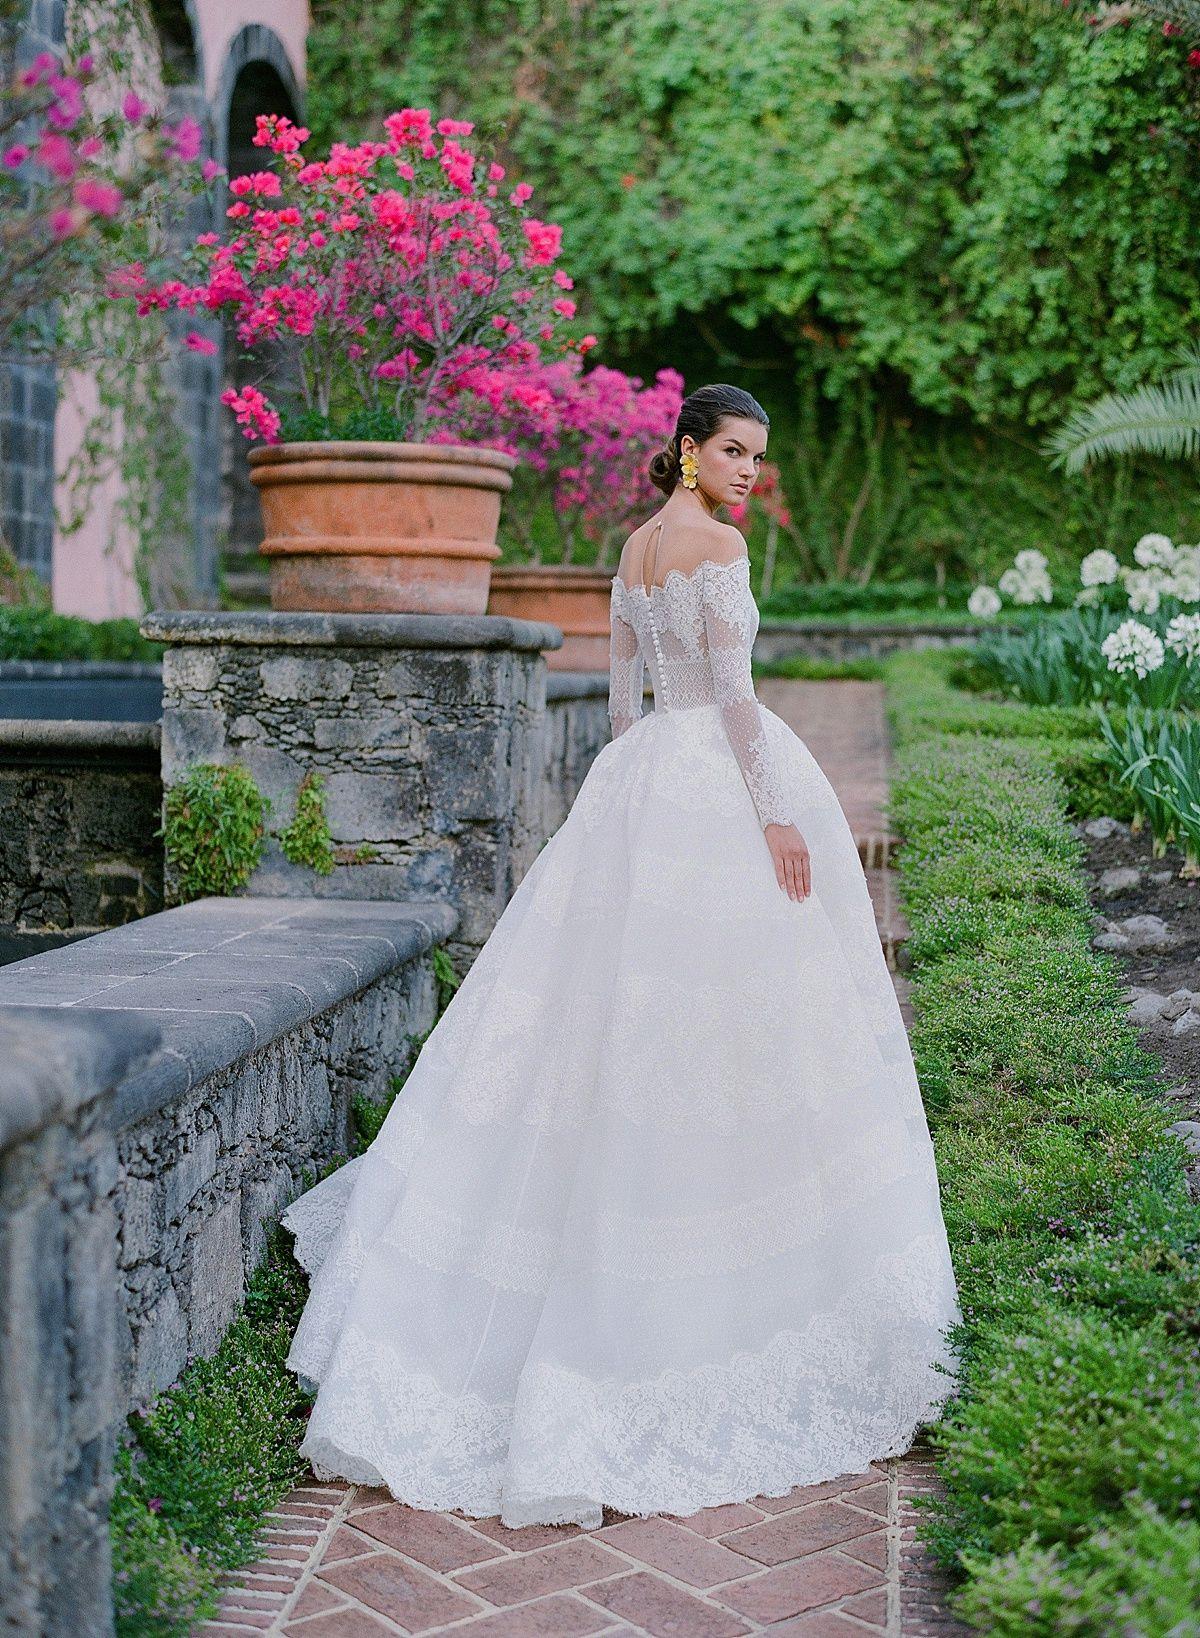 Hacienda De San Antonio Kleinfeld Campaign In 2020 Wedding Dresses Lace Ballgown Wedding Dress Long Sleeve Wedding Dresses Zuhair Murad [ 1638 x 1200 Pixel ]